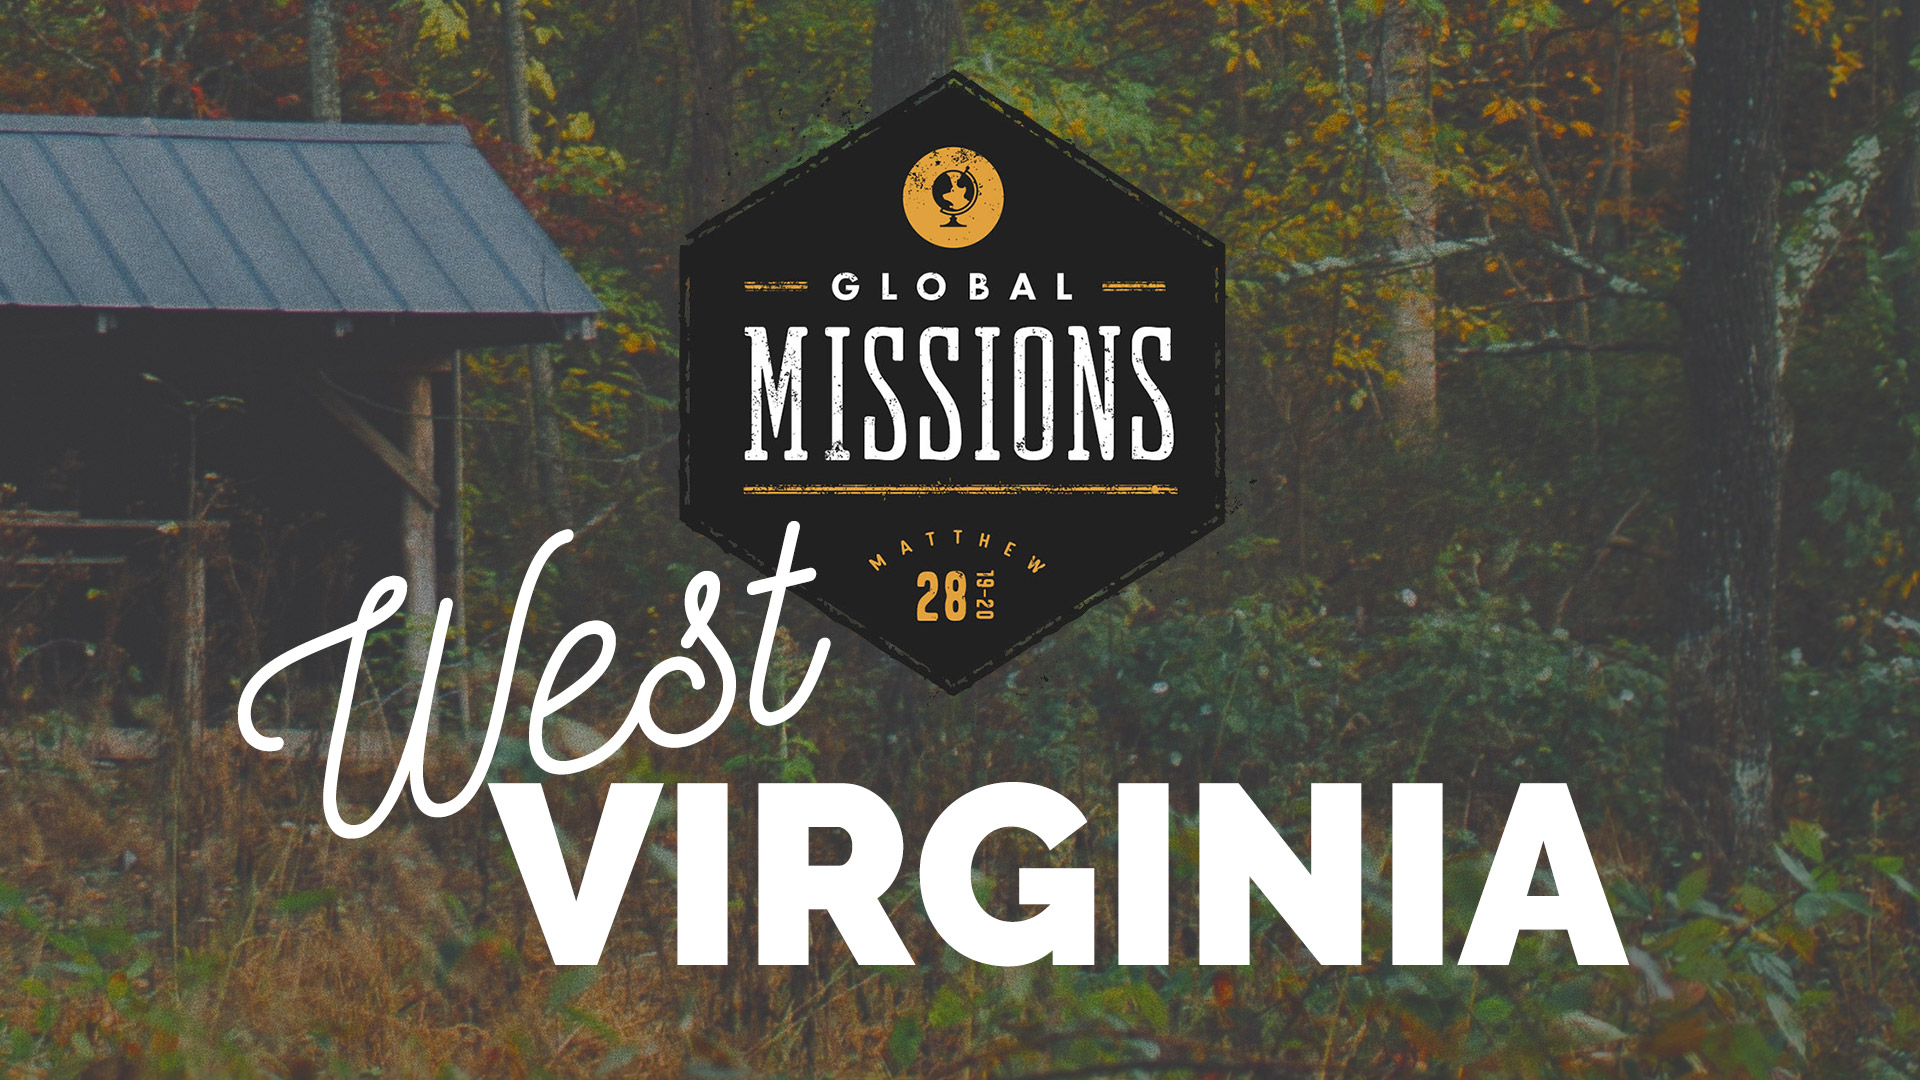 Mission-West-Virginia.jpg